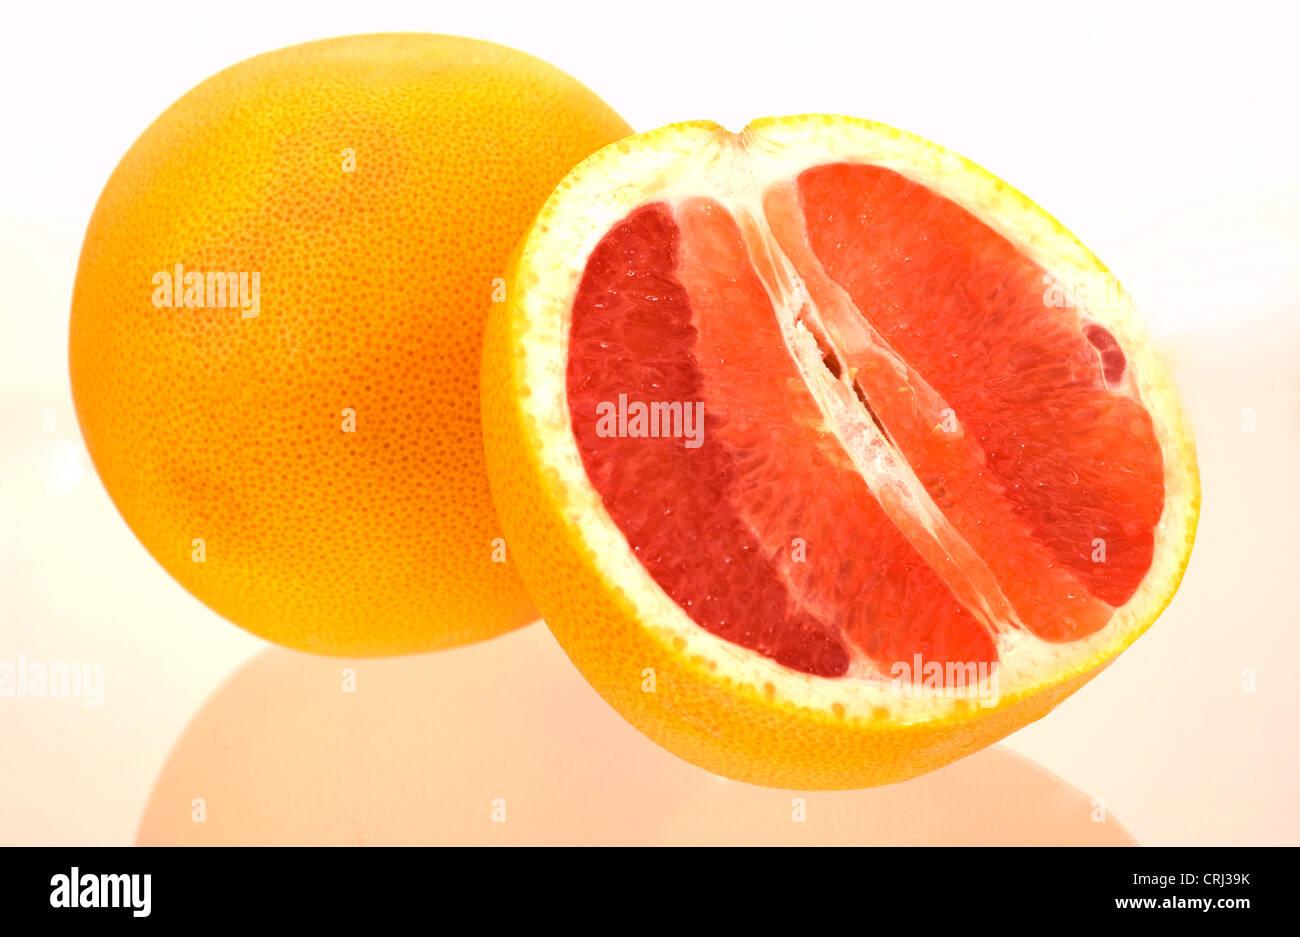 Licopeno, un antioxidante Citrus Citrus paradisi toronja fruta Alimentos Alimentos mitad mitades sana sana Dieta Imagen De Stock